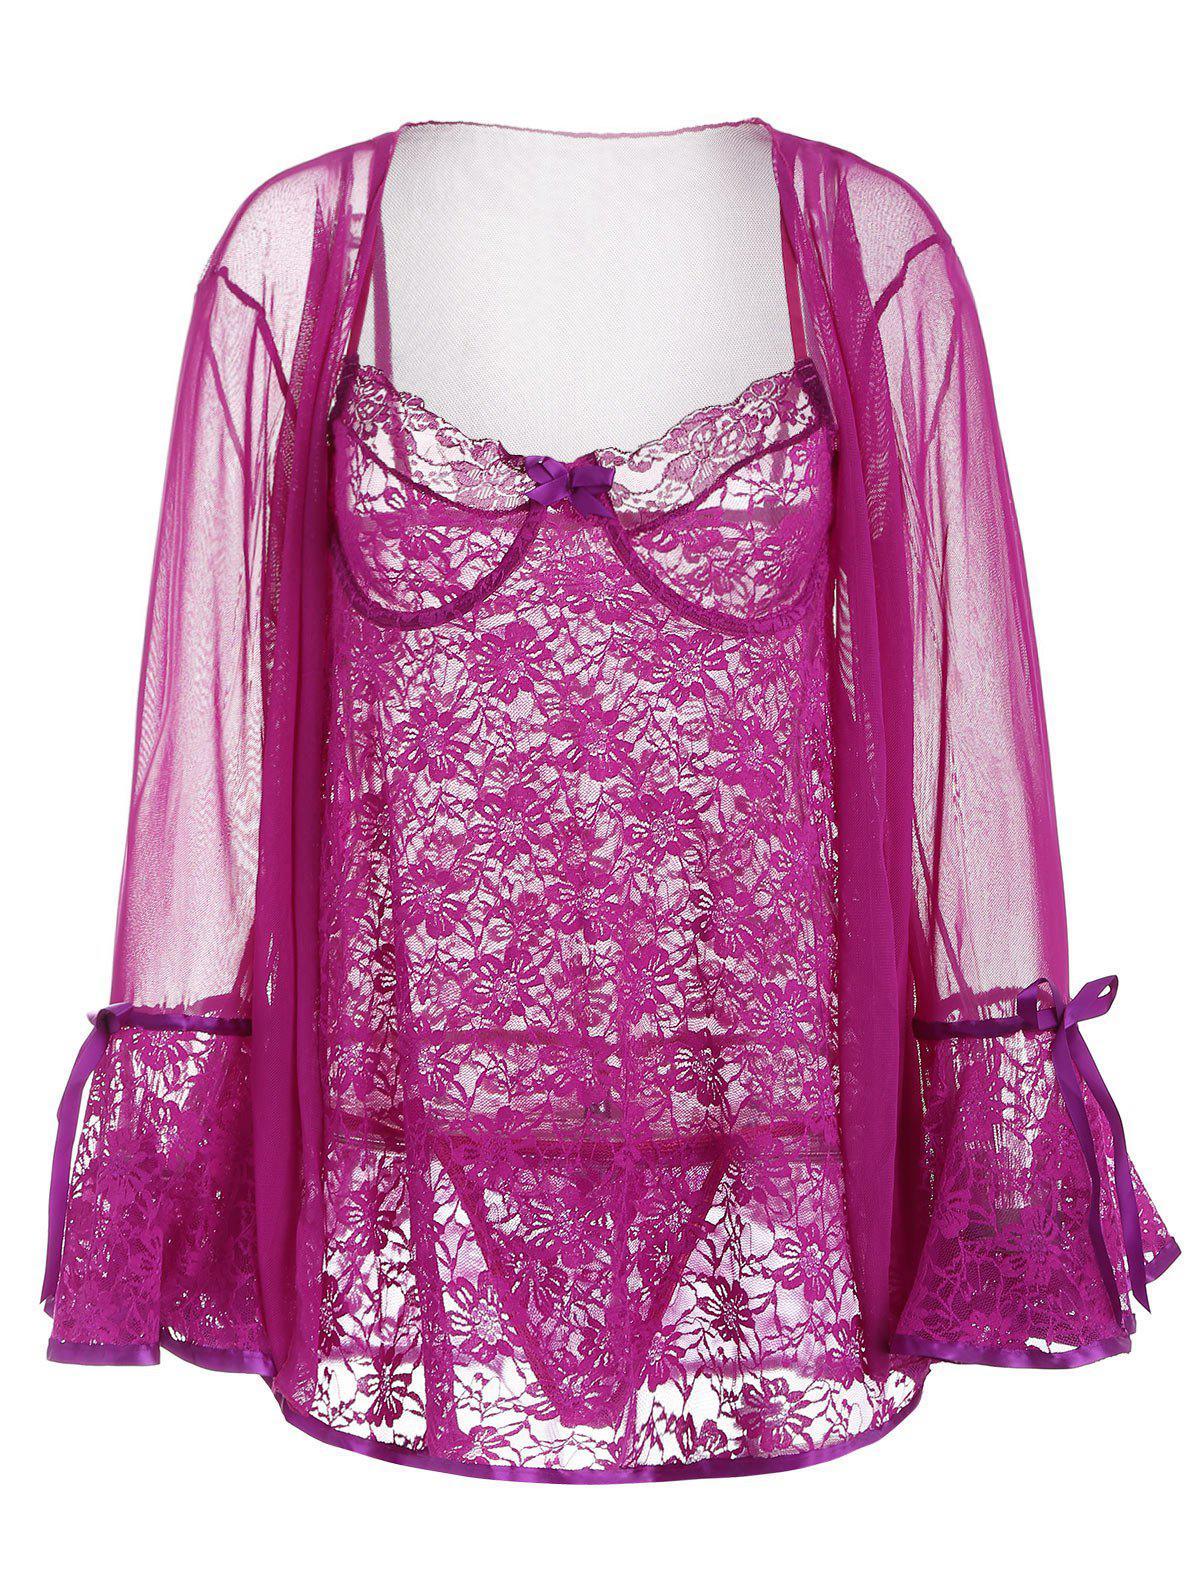 Underwire Lace Babydoll and Mesh Kimono 263939401